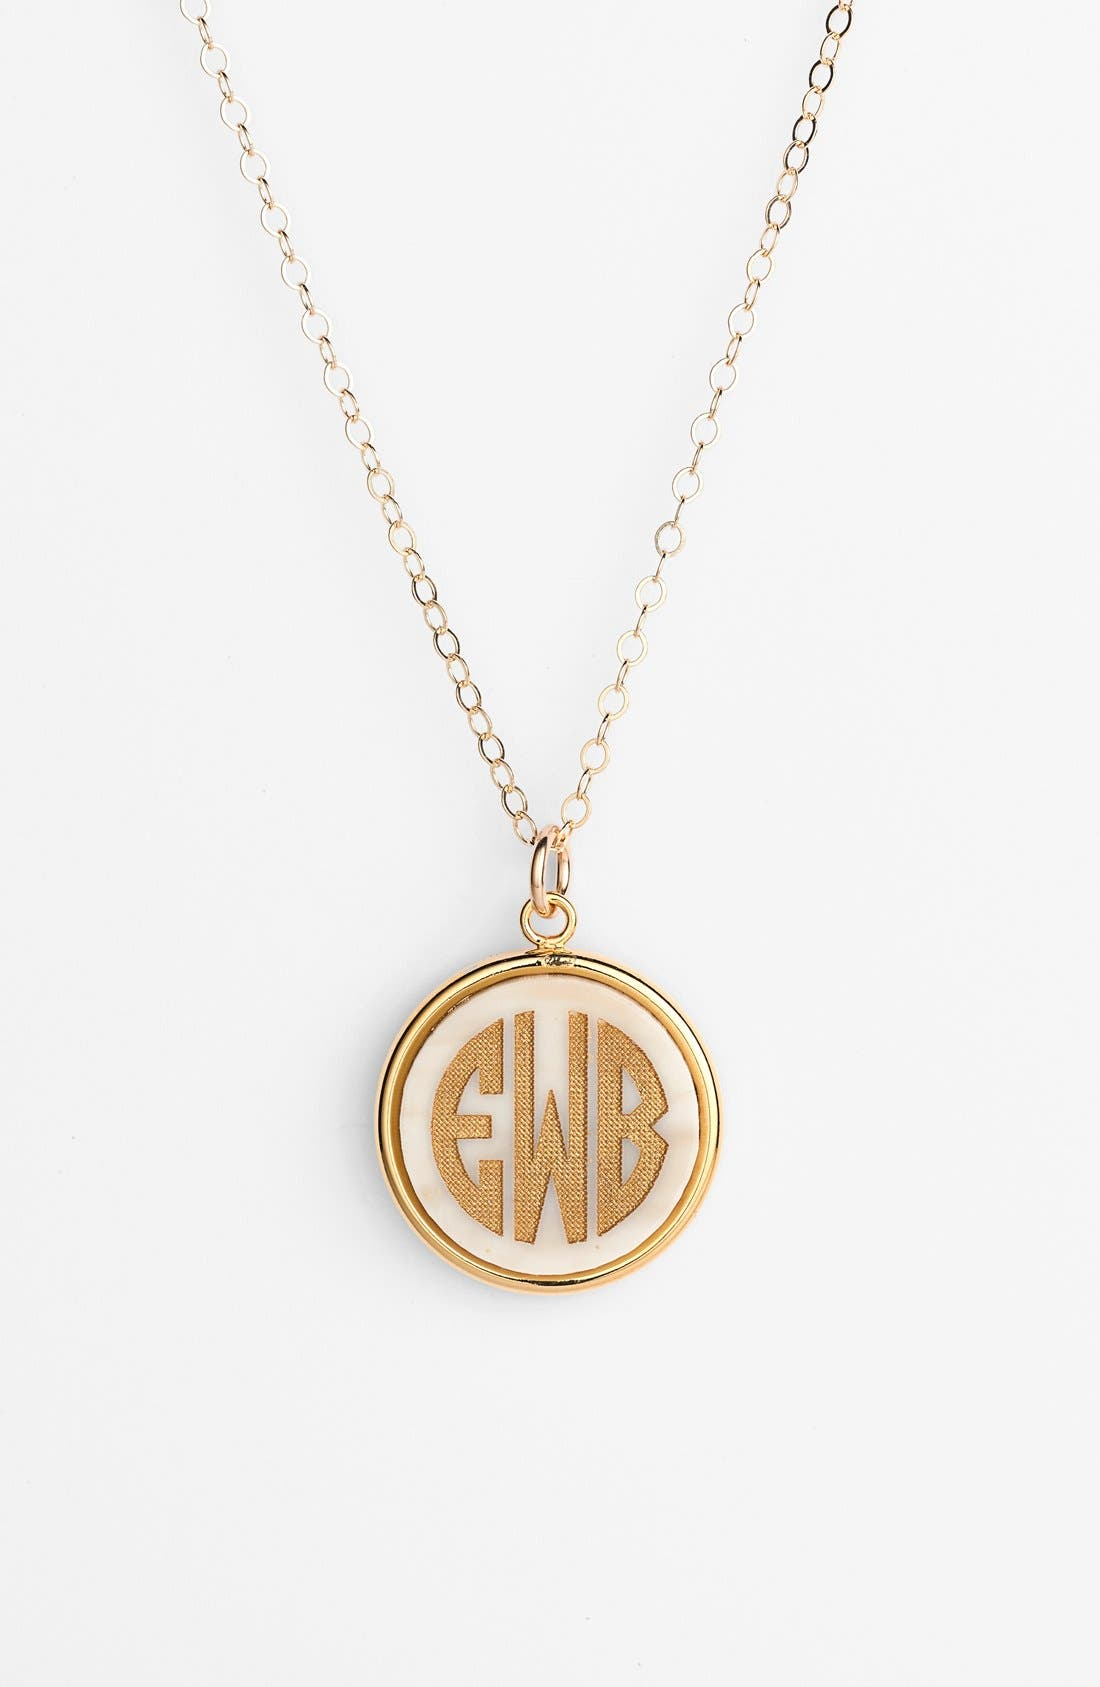 moon and lola  u0026 39 vineyard u0026 39  personalized monogram pendant necklace